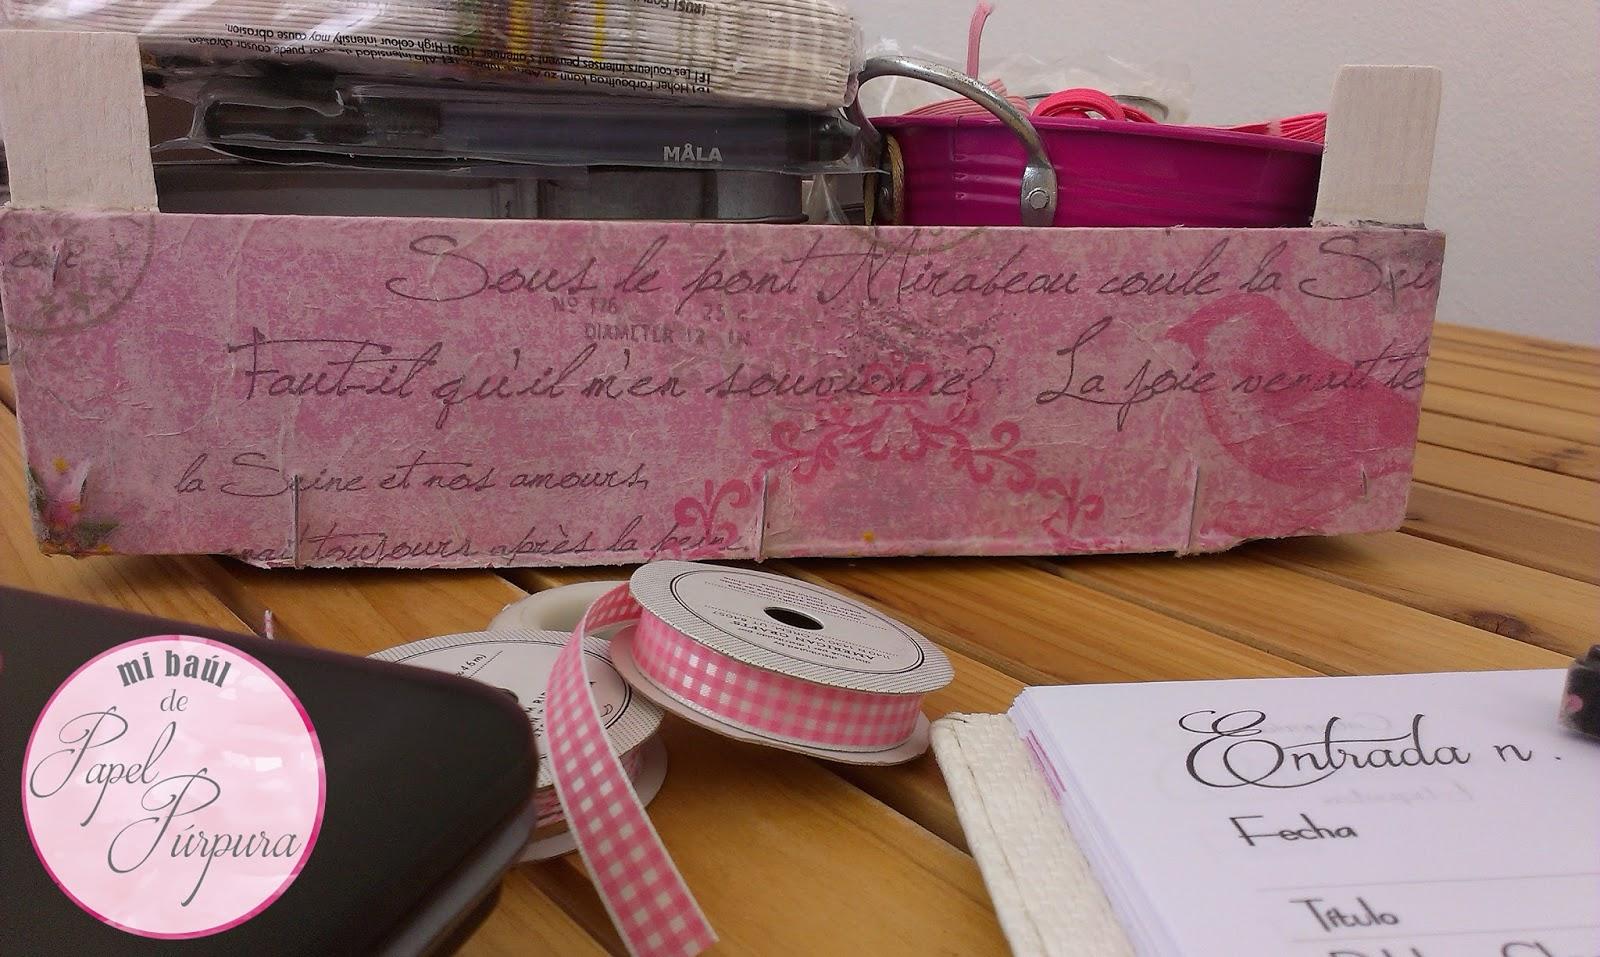 paso a paso para decorar caja de fresas mi baul de papel